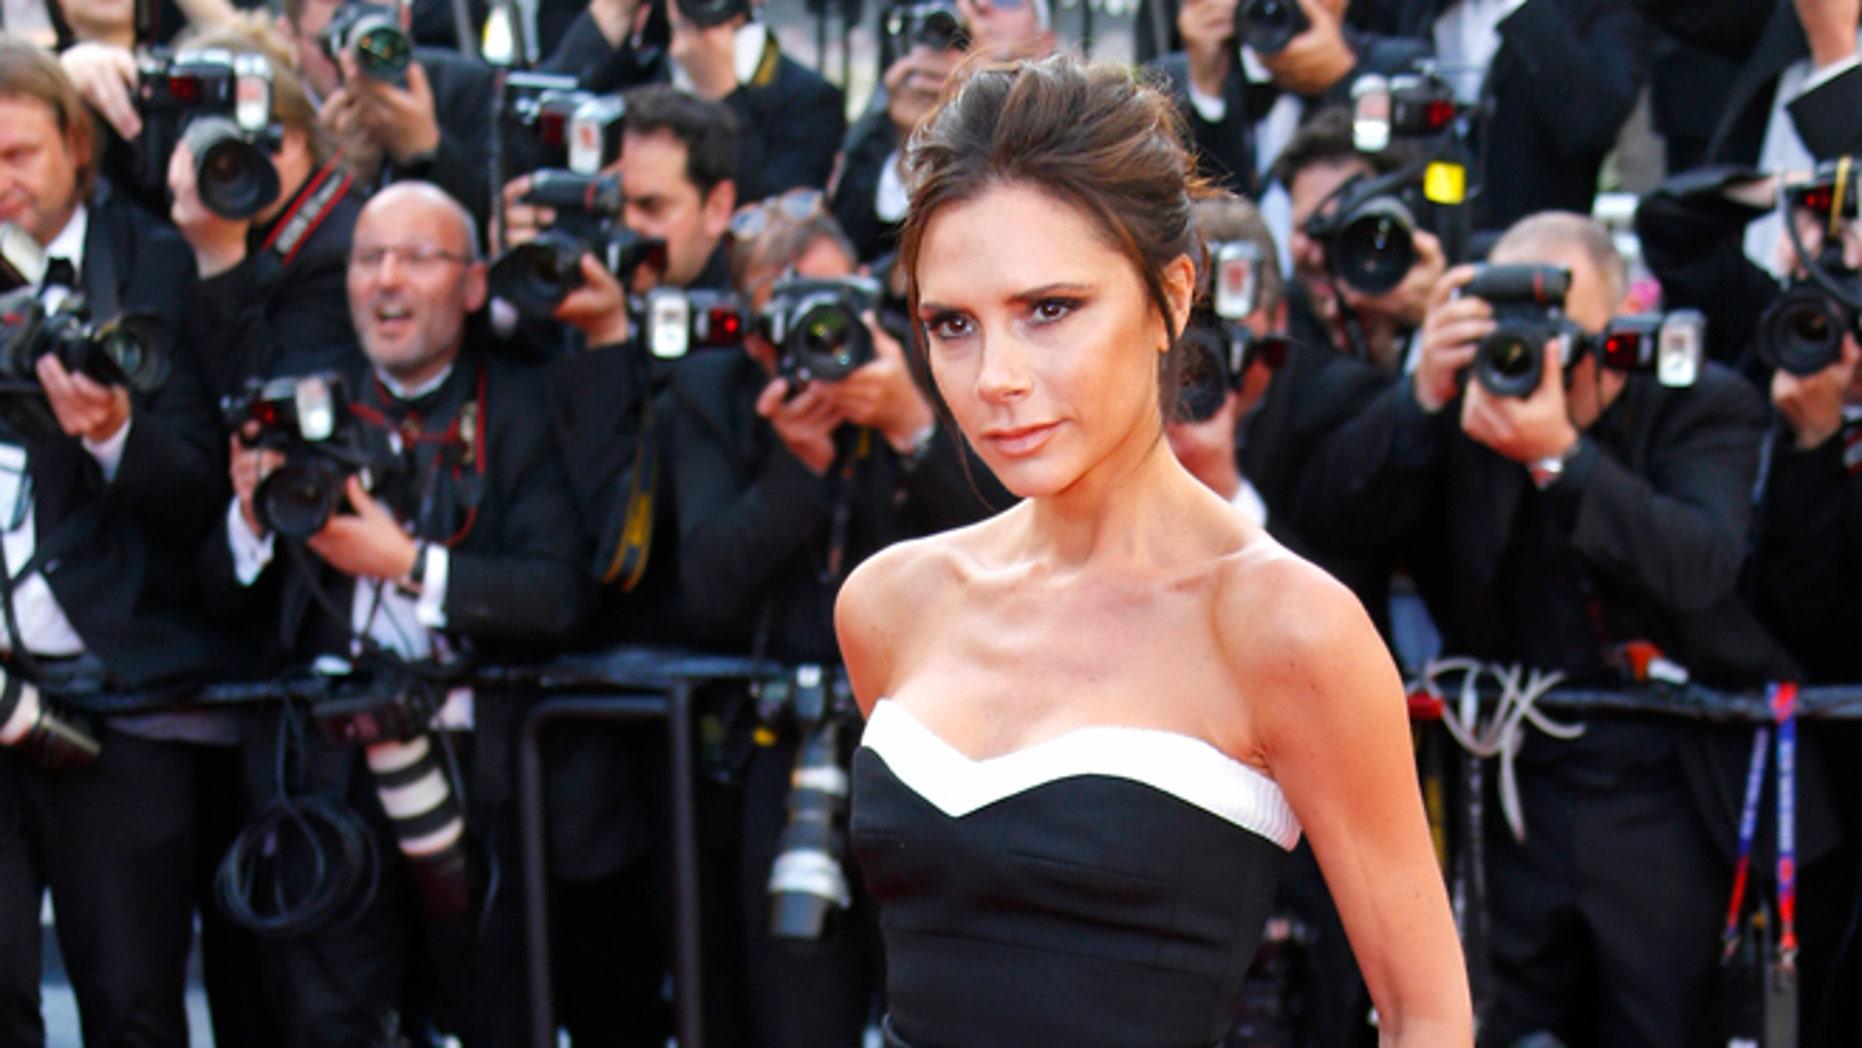 Victoria Beckham has been recognized in Queen Elizabeth's New Year's Honors List